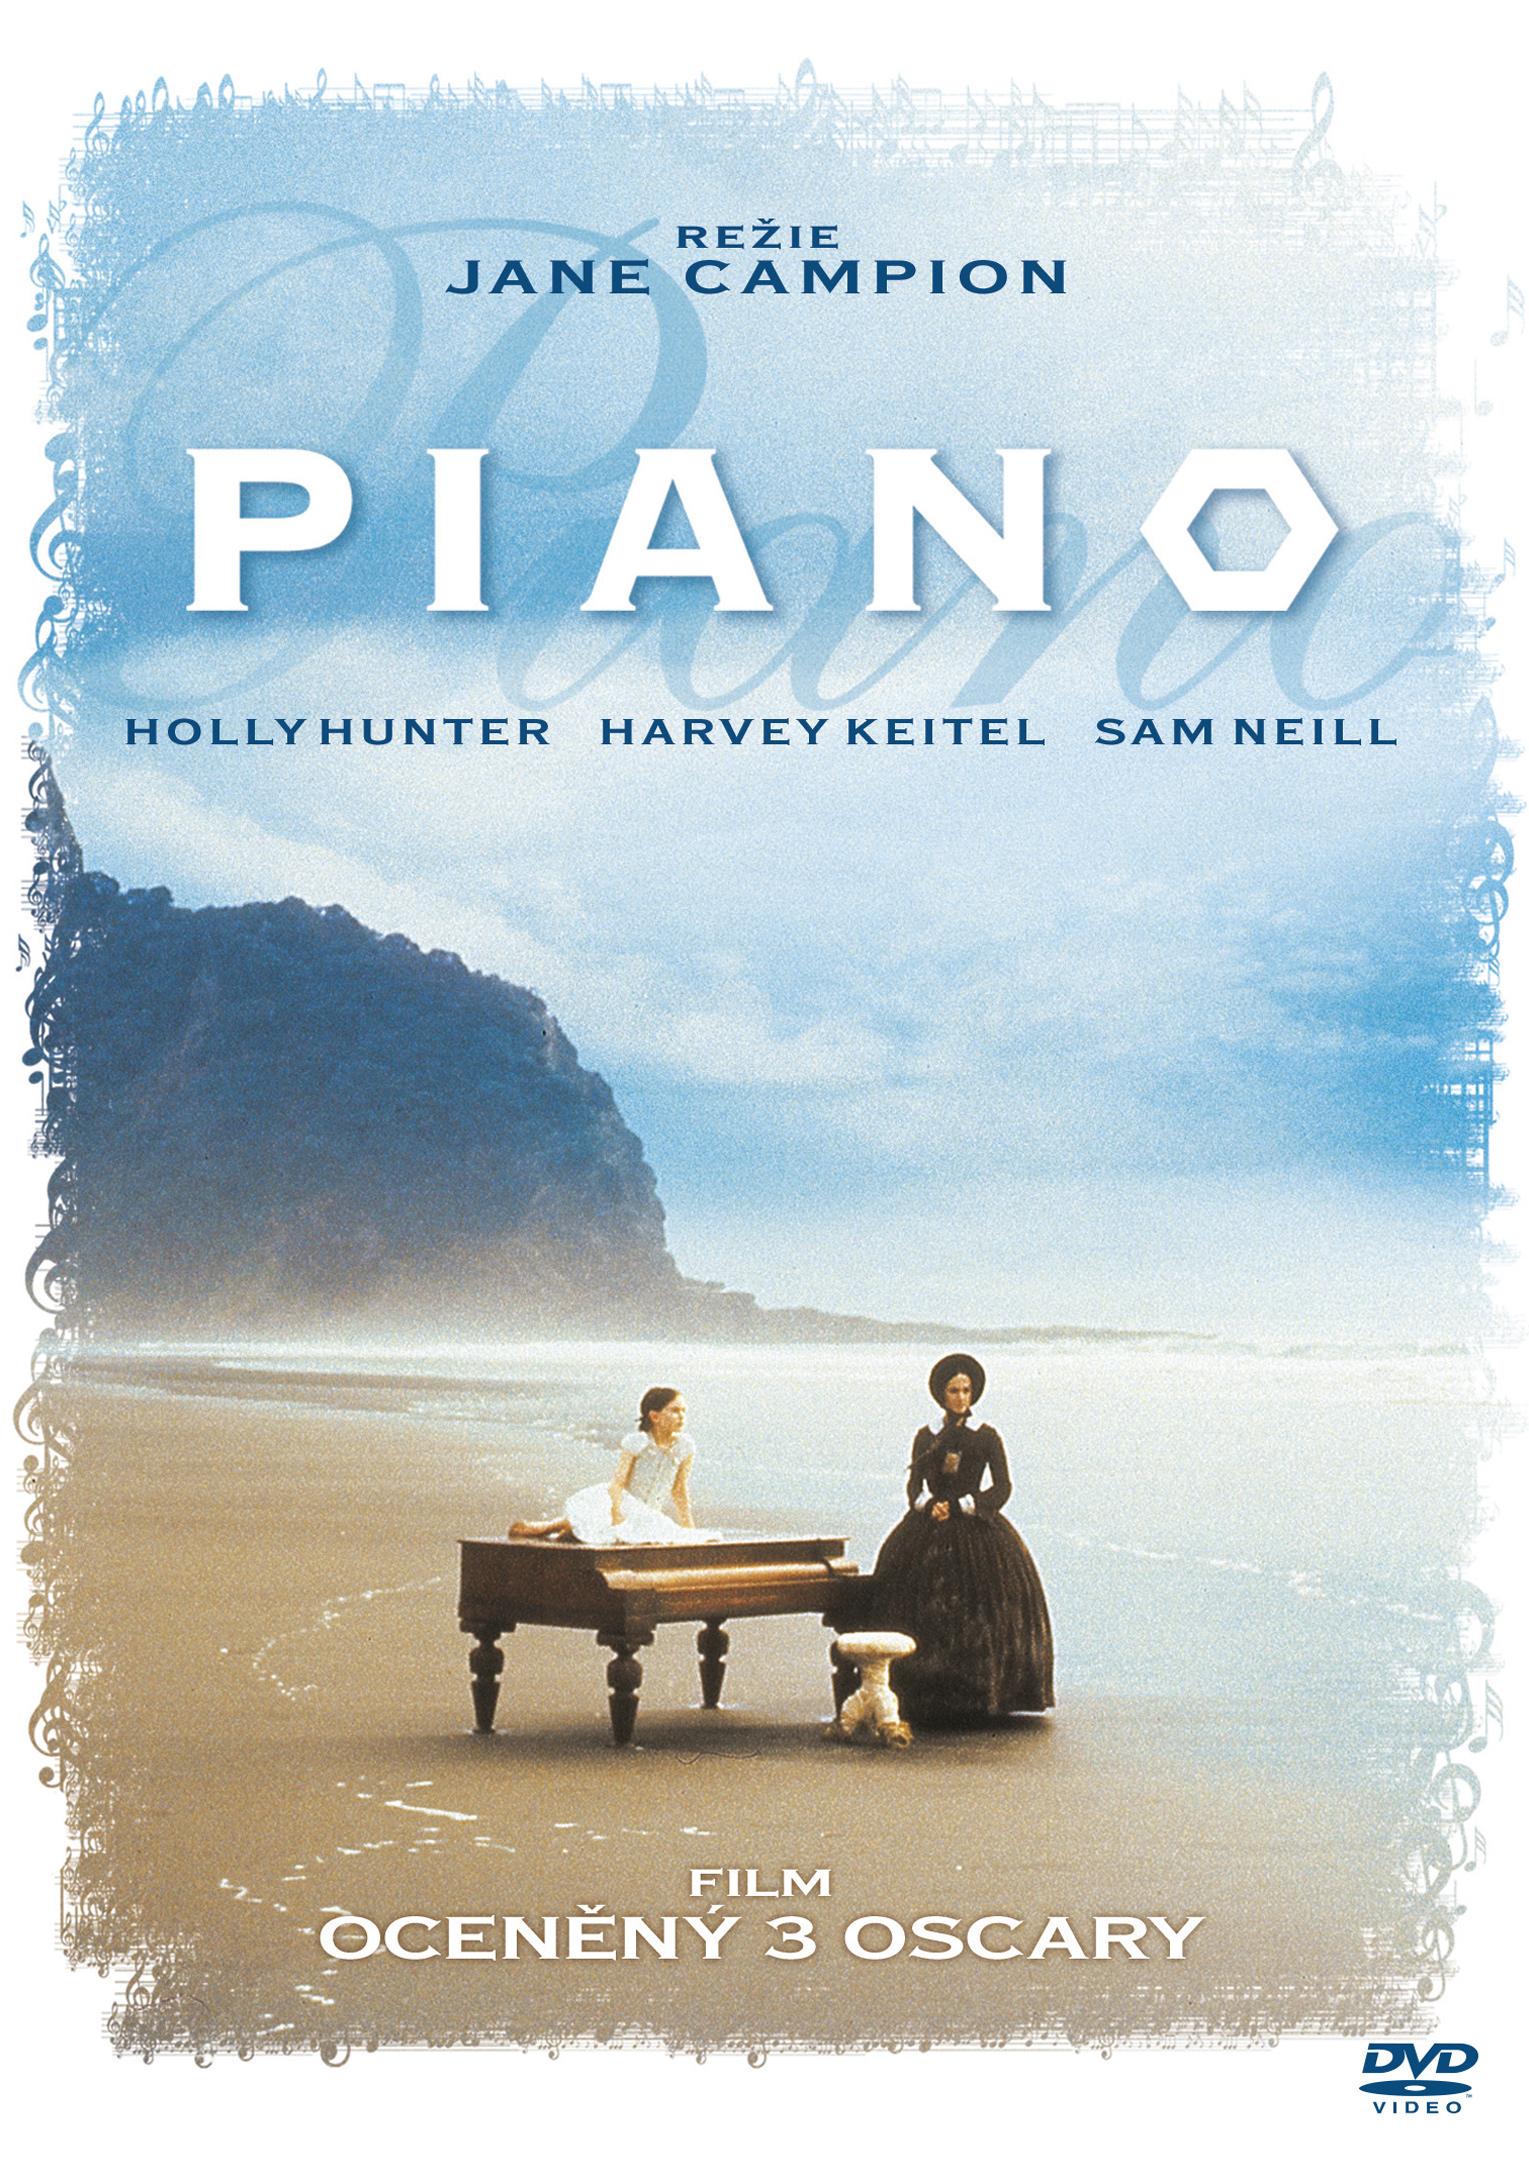 Oppression in jane campions the piano essay